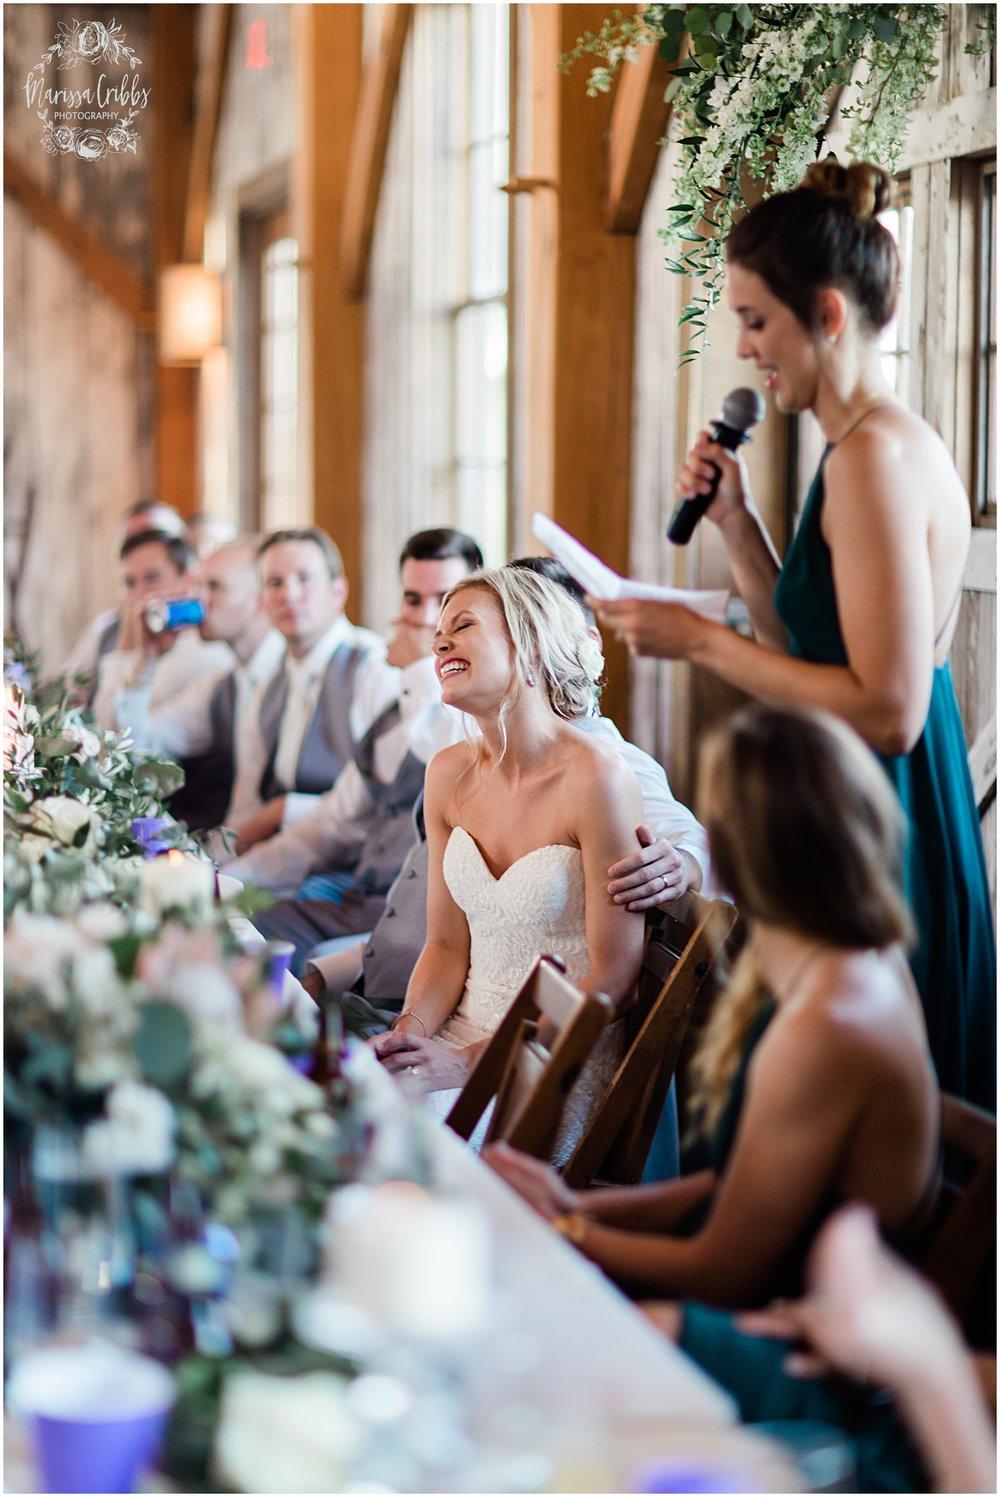 RHODES WEDDING | WESTON RED BARN FARM | MARISSA CRIBBS PHOTOGRAPHY_5309.jpg